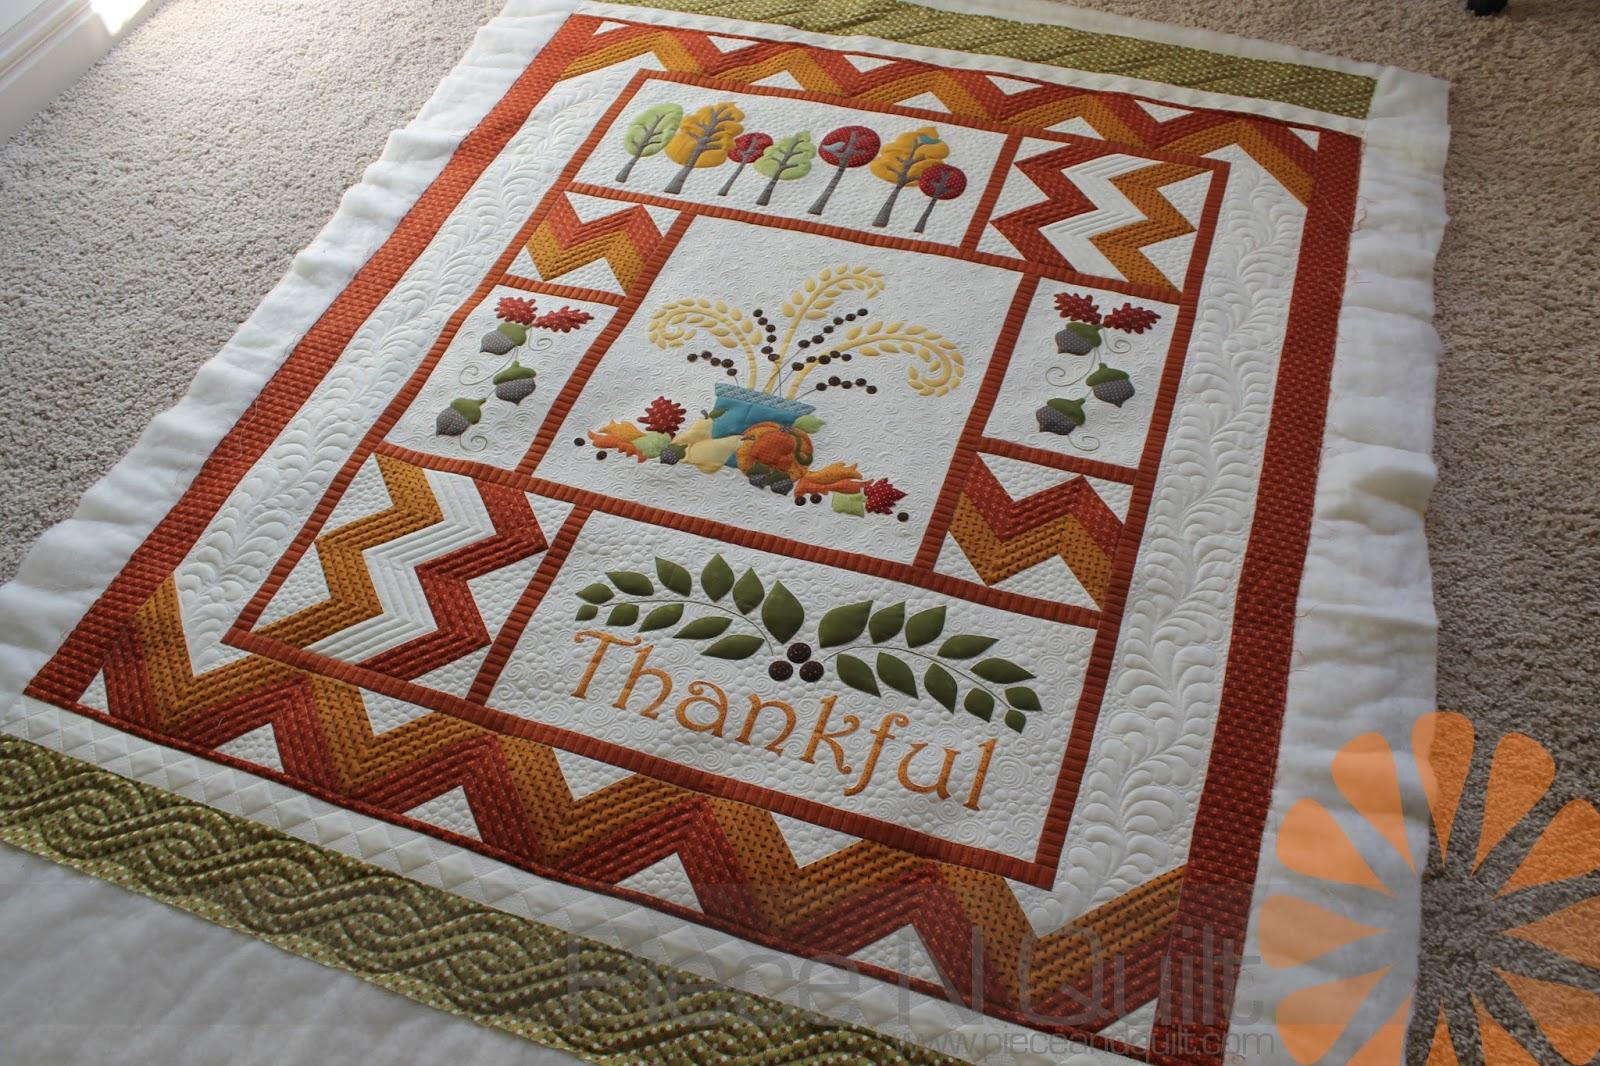 Piece N Quilt: Thankful - A Fall Quilt - Custom Machine Quilting ... : quilting pieces - Adamdwight.com